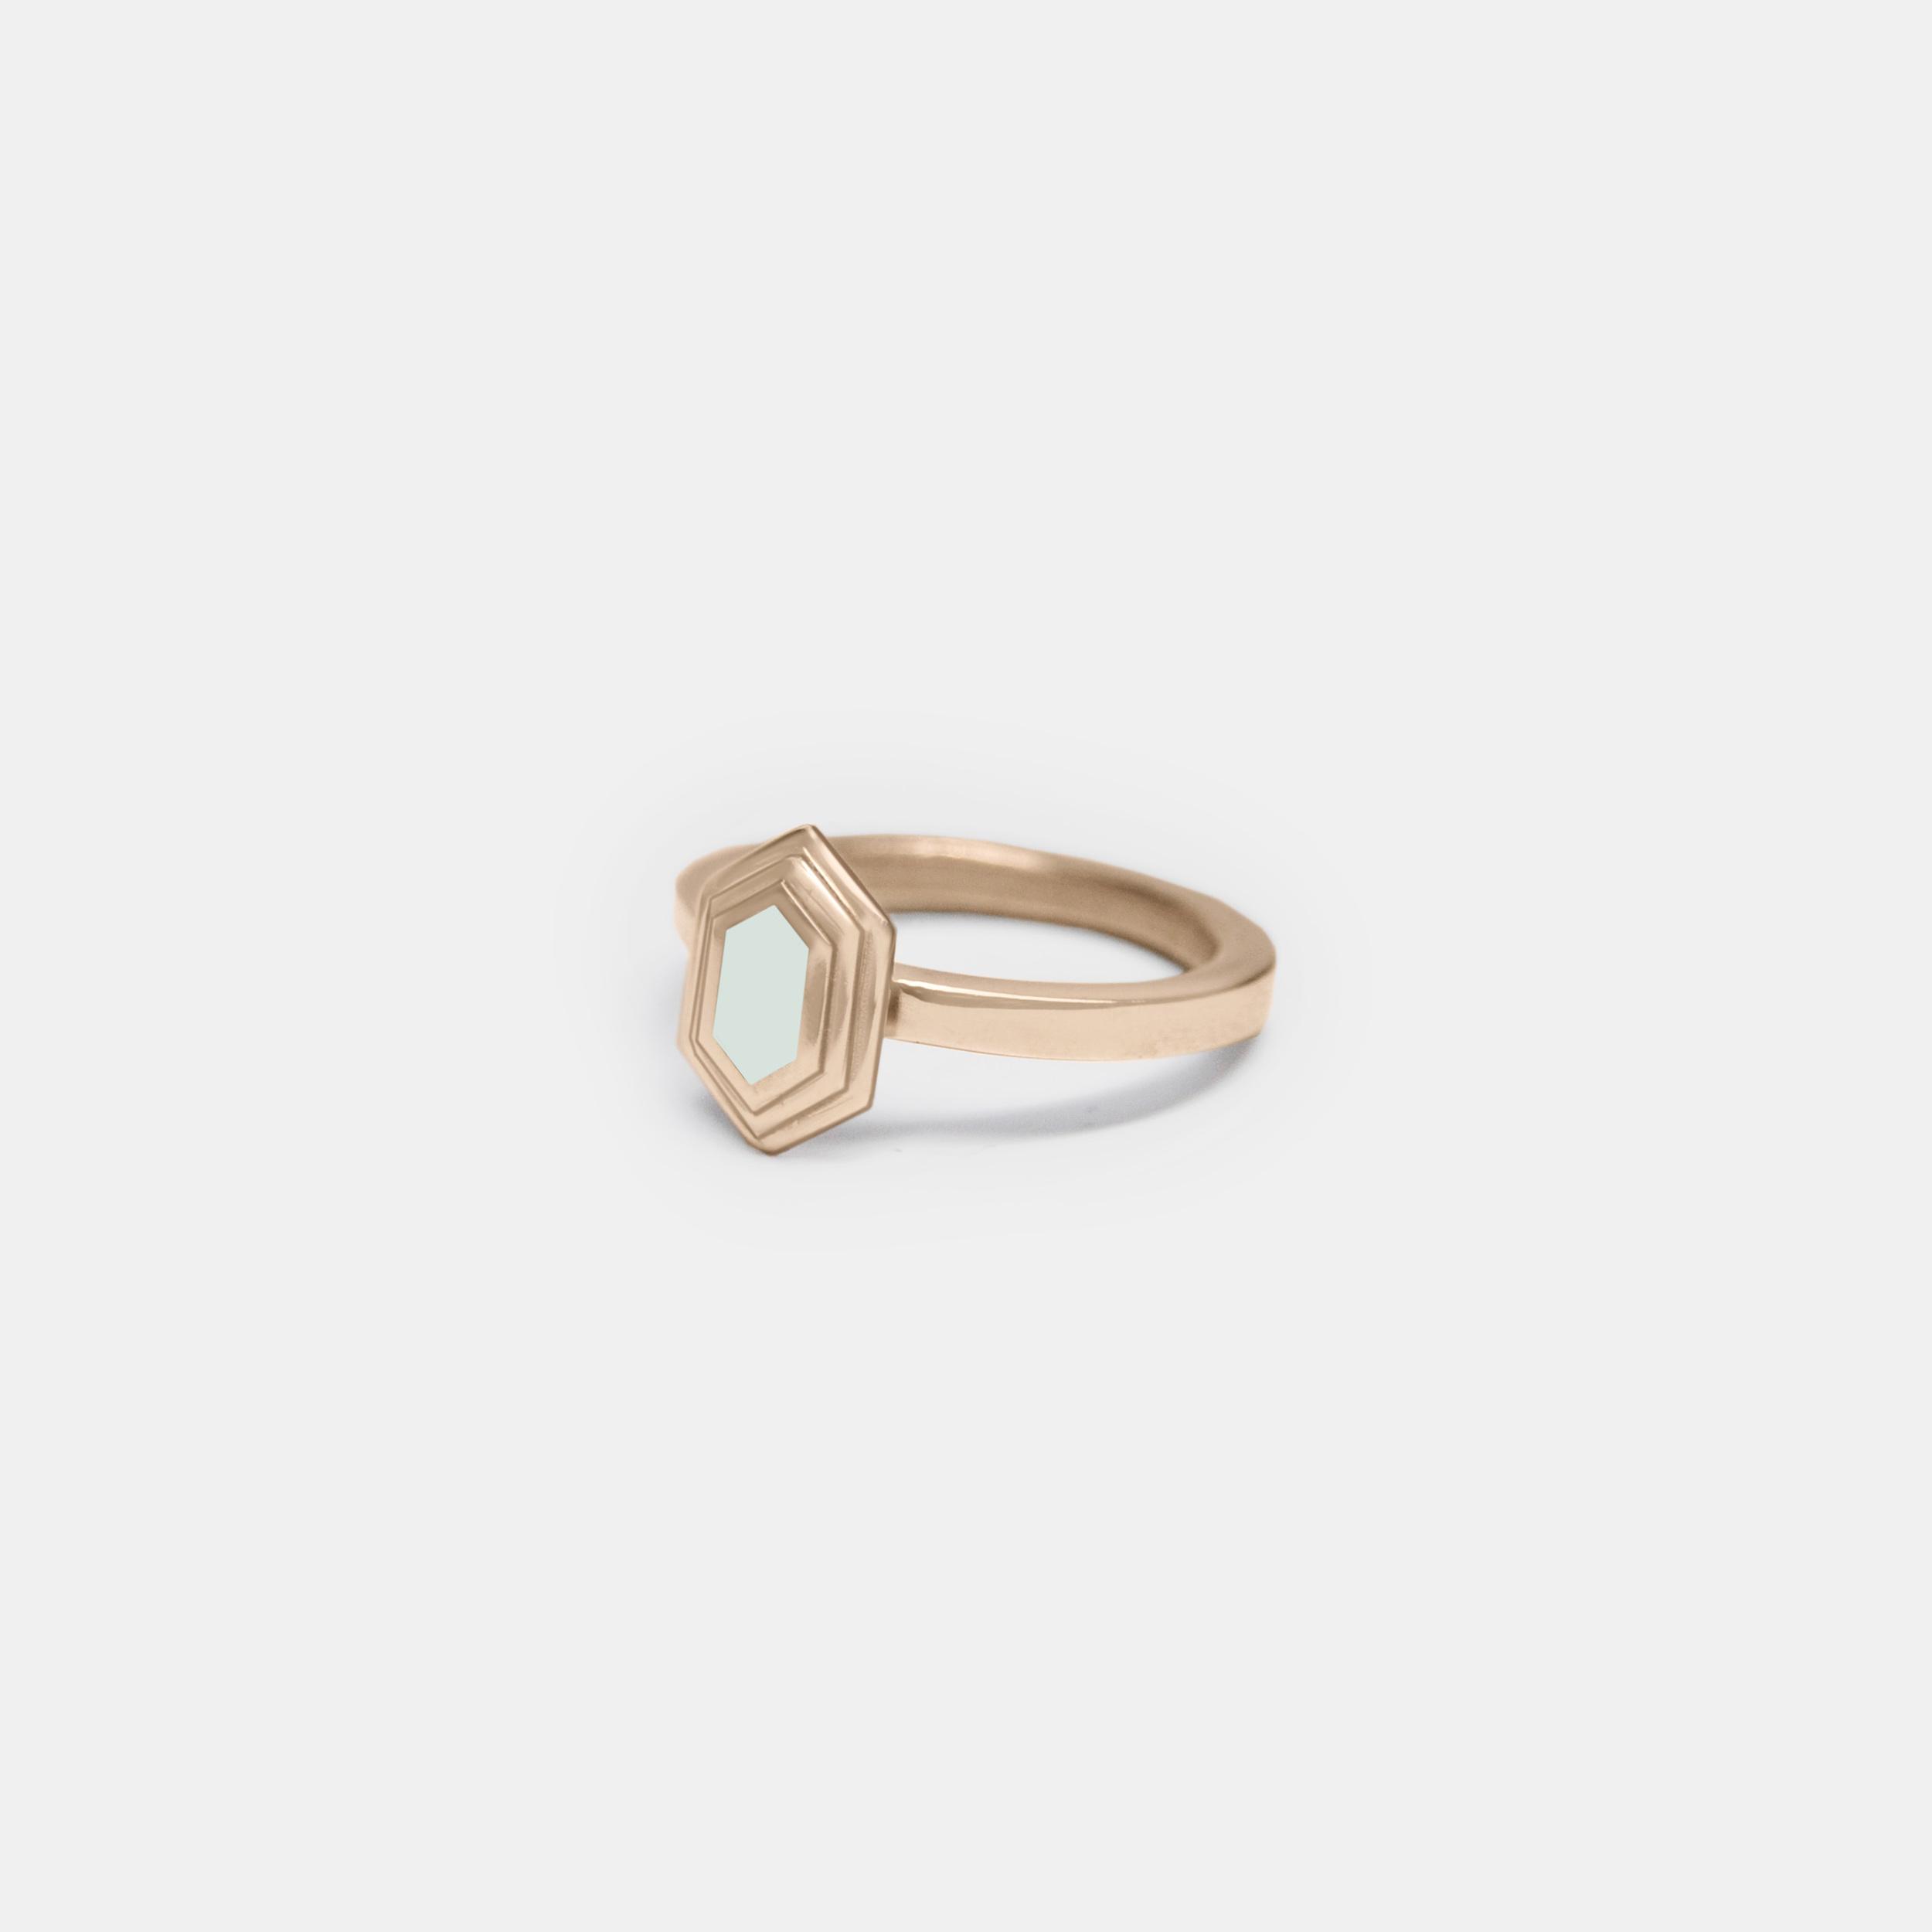 Marisa-Lomonaco-Custom-Jewelry-Hudson-Valley_0000_Axis-Ring-Bronze-Mint.jpg